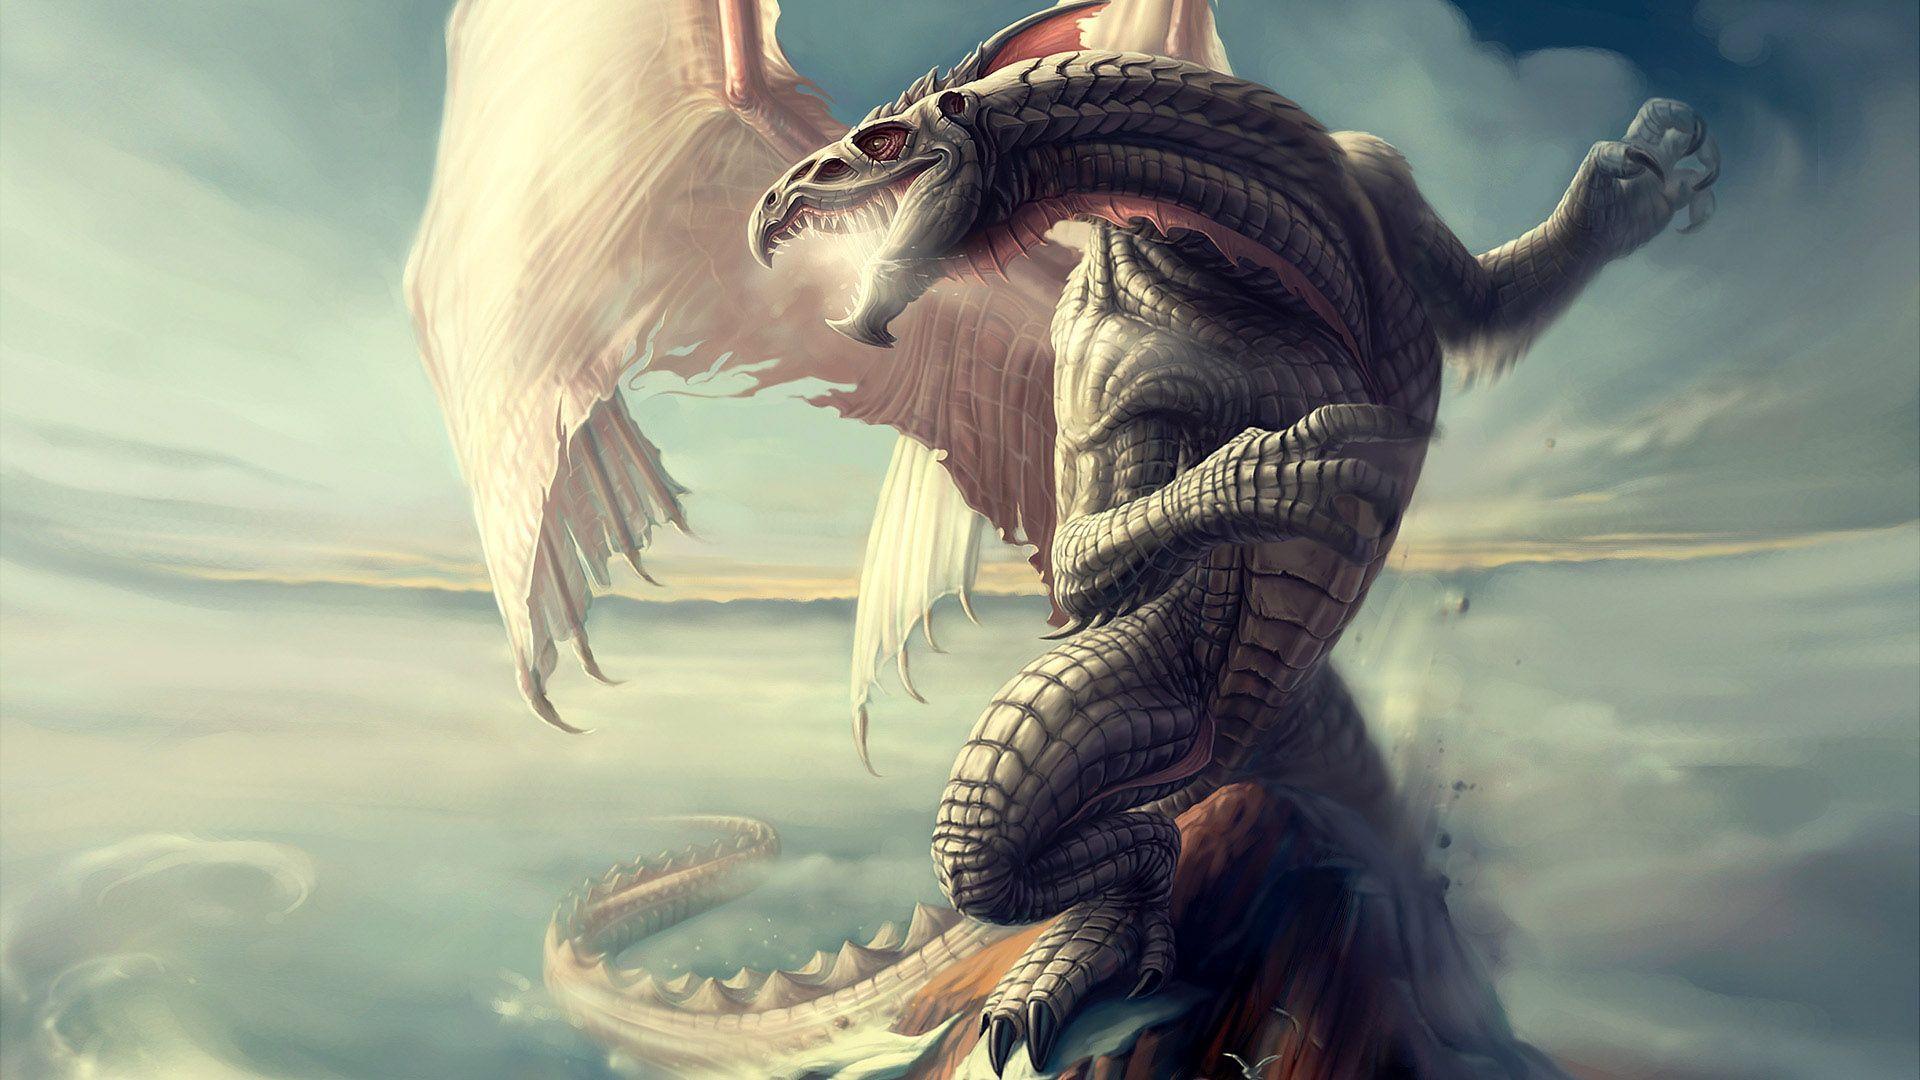 Free Dragon Image Free Download Download Free Clip Art Free Clip